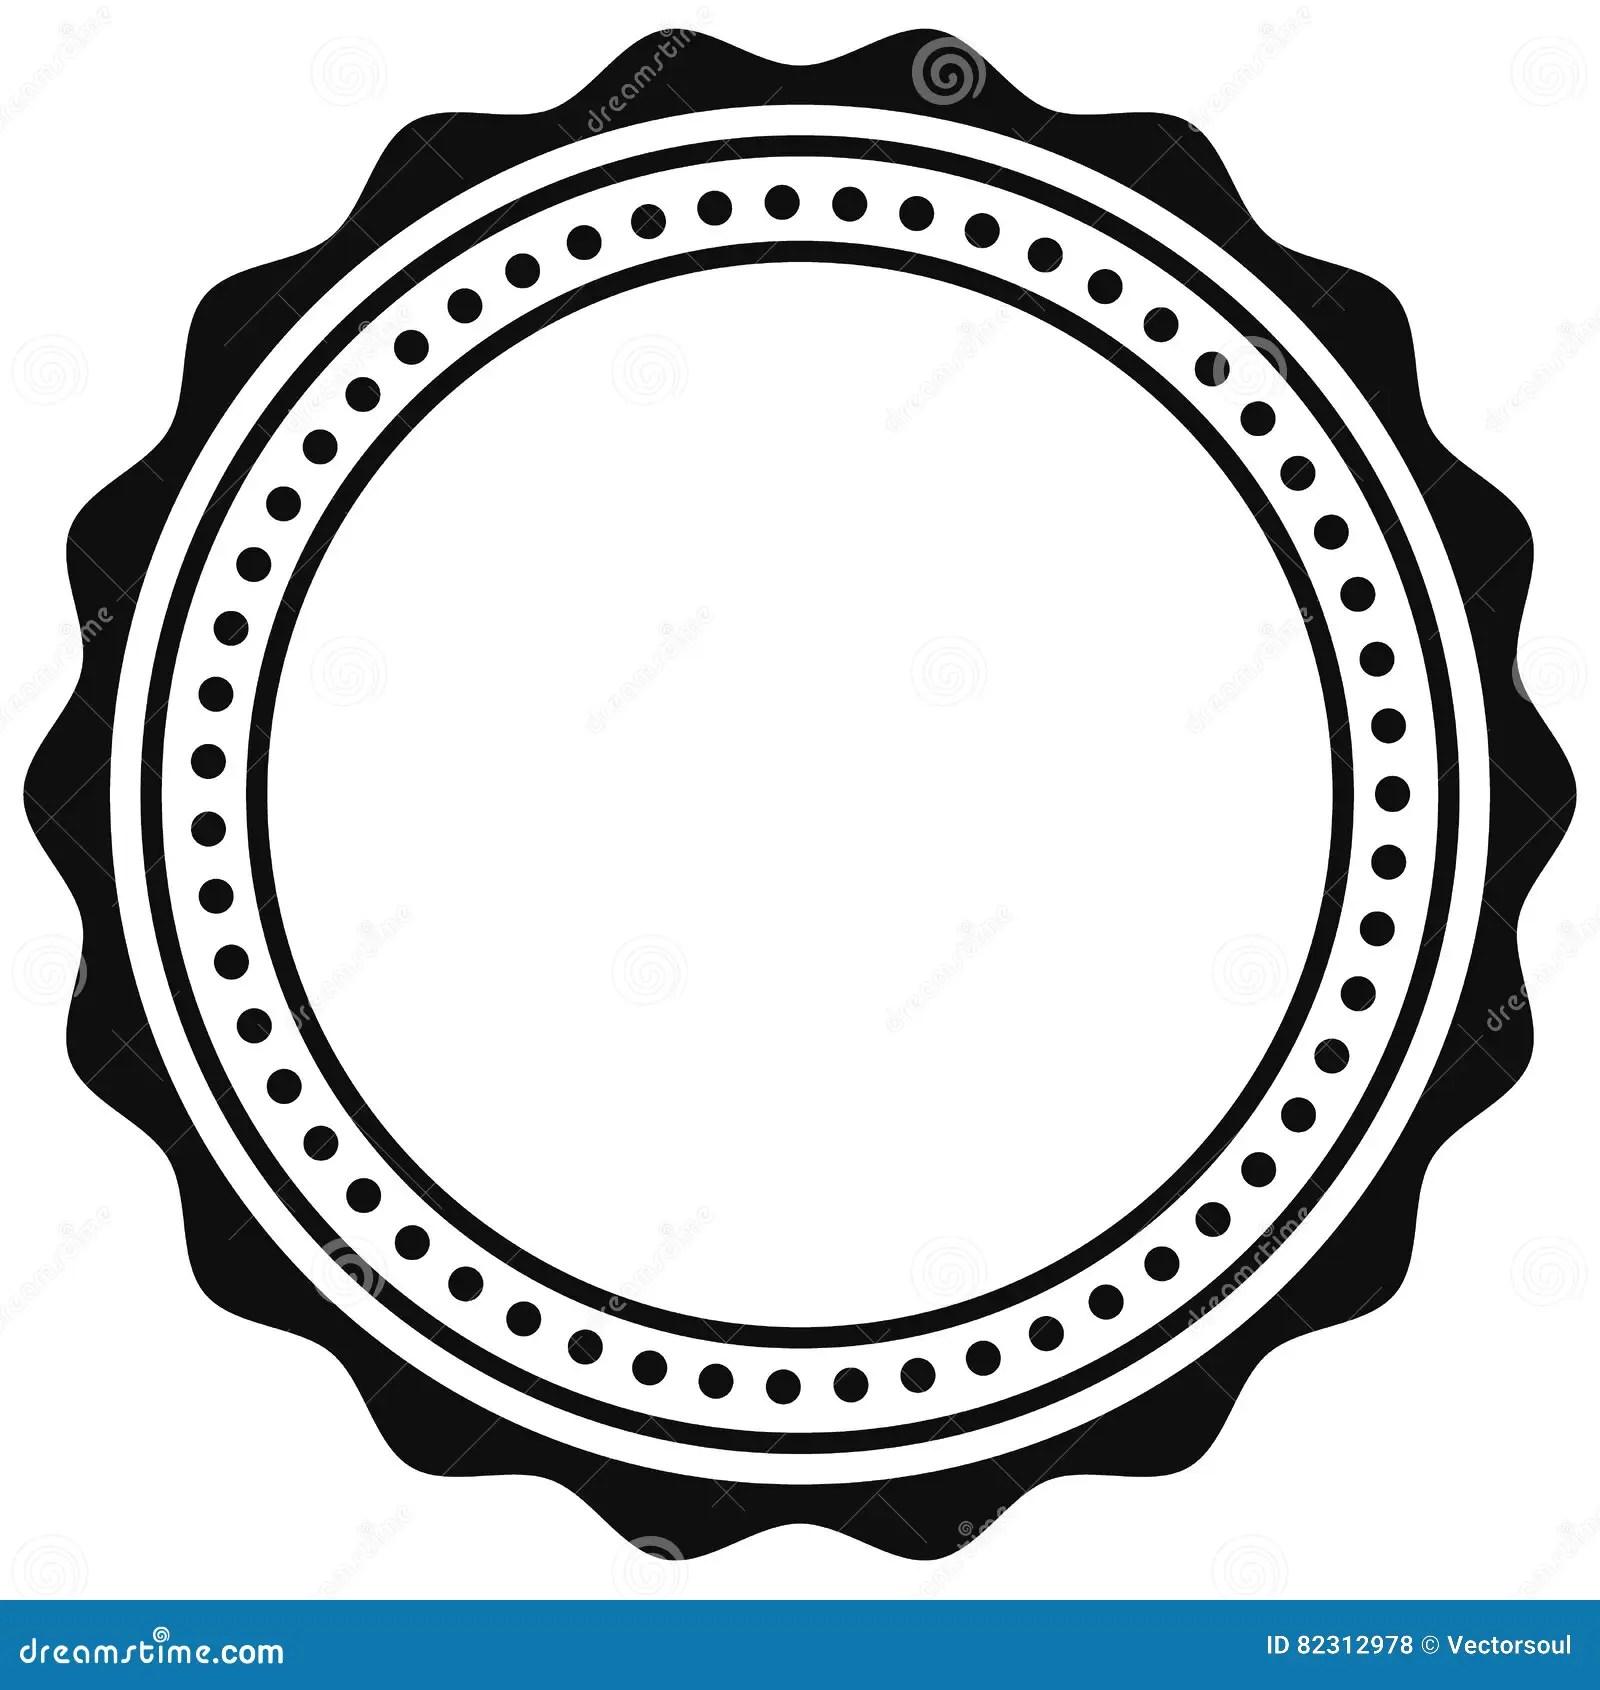 Badge Seal Element Contour Of Circular Certificate